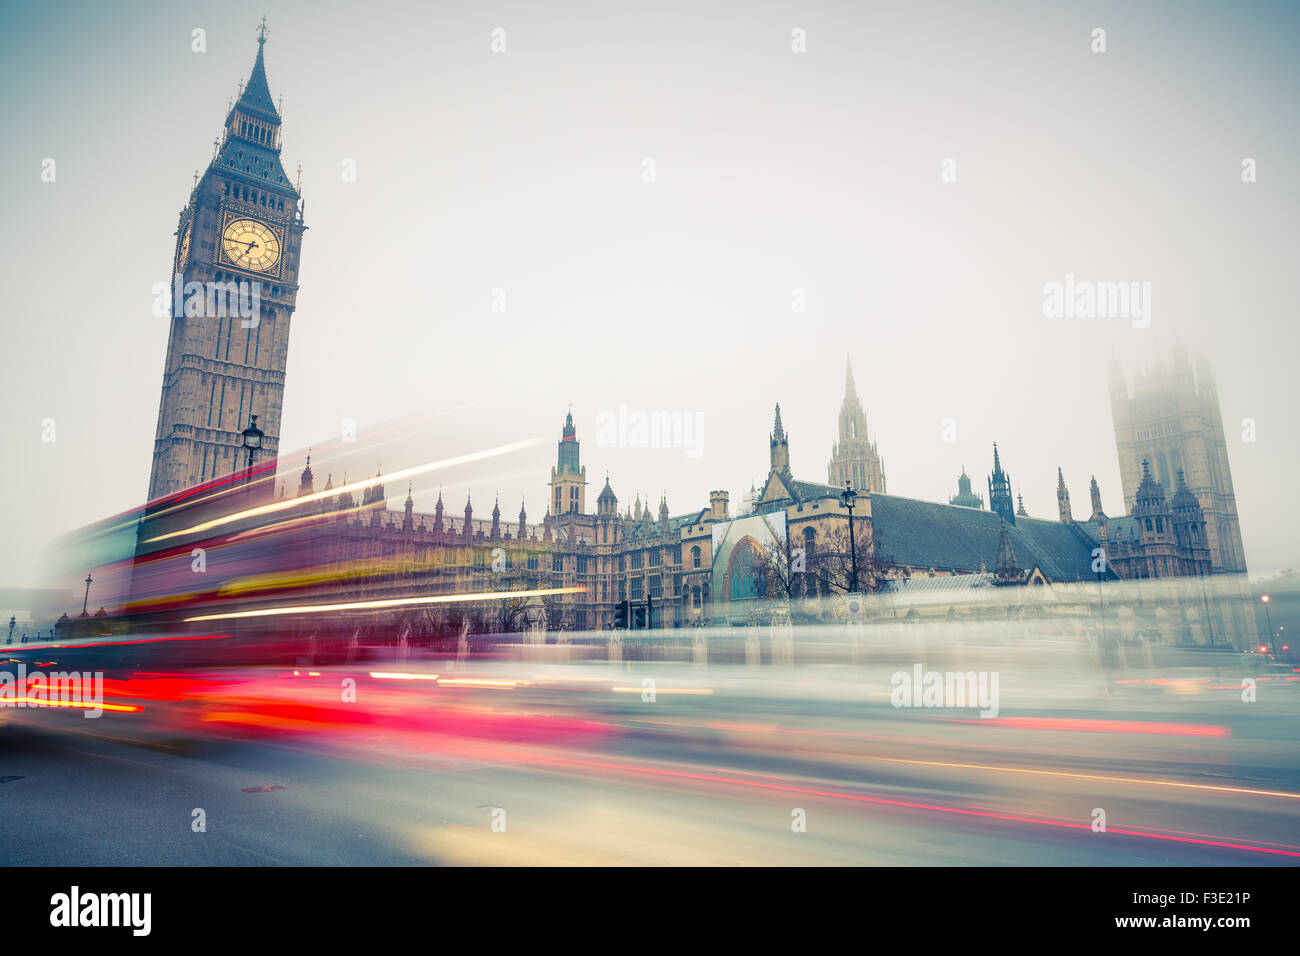 Big Ben and double-decker bus, London - Stock Image